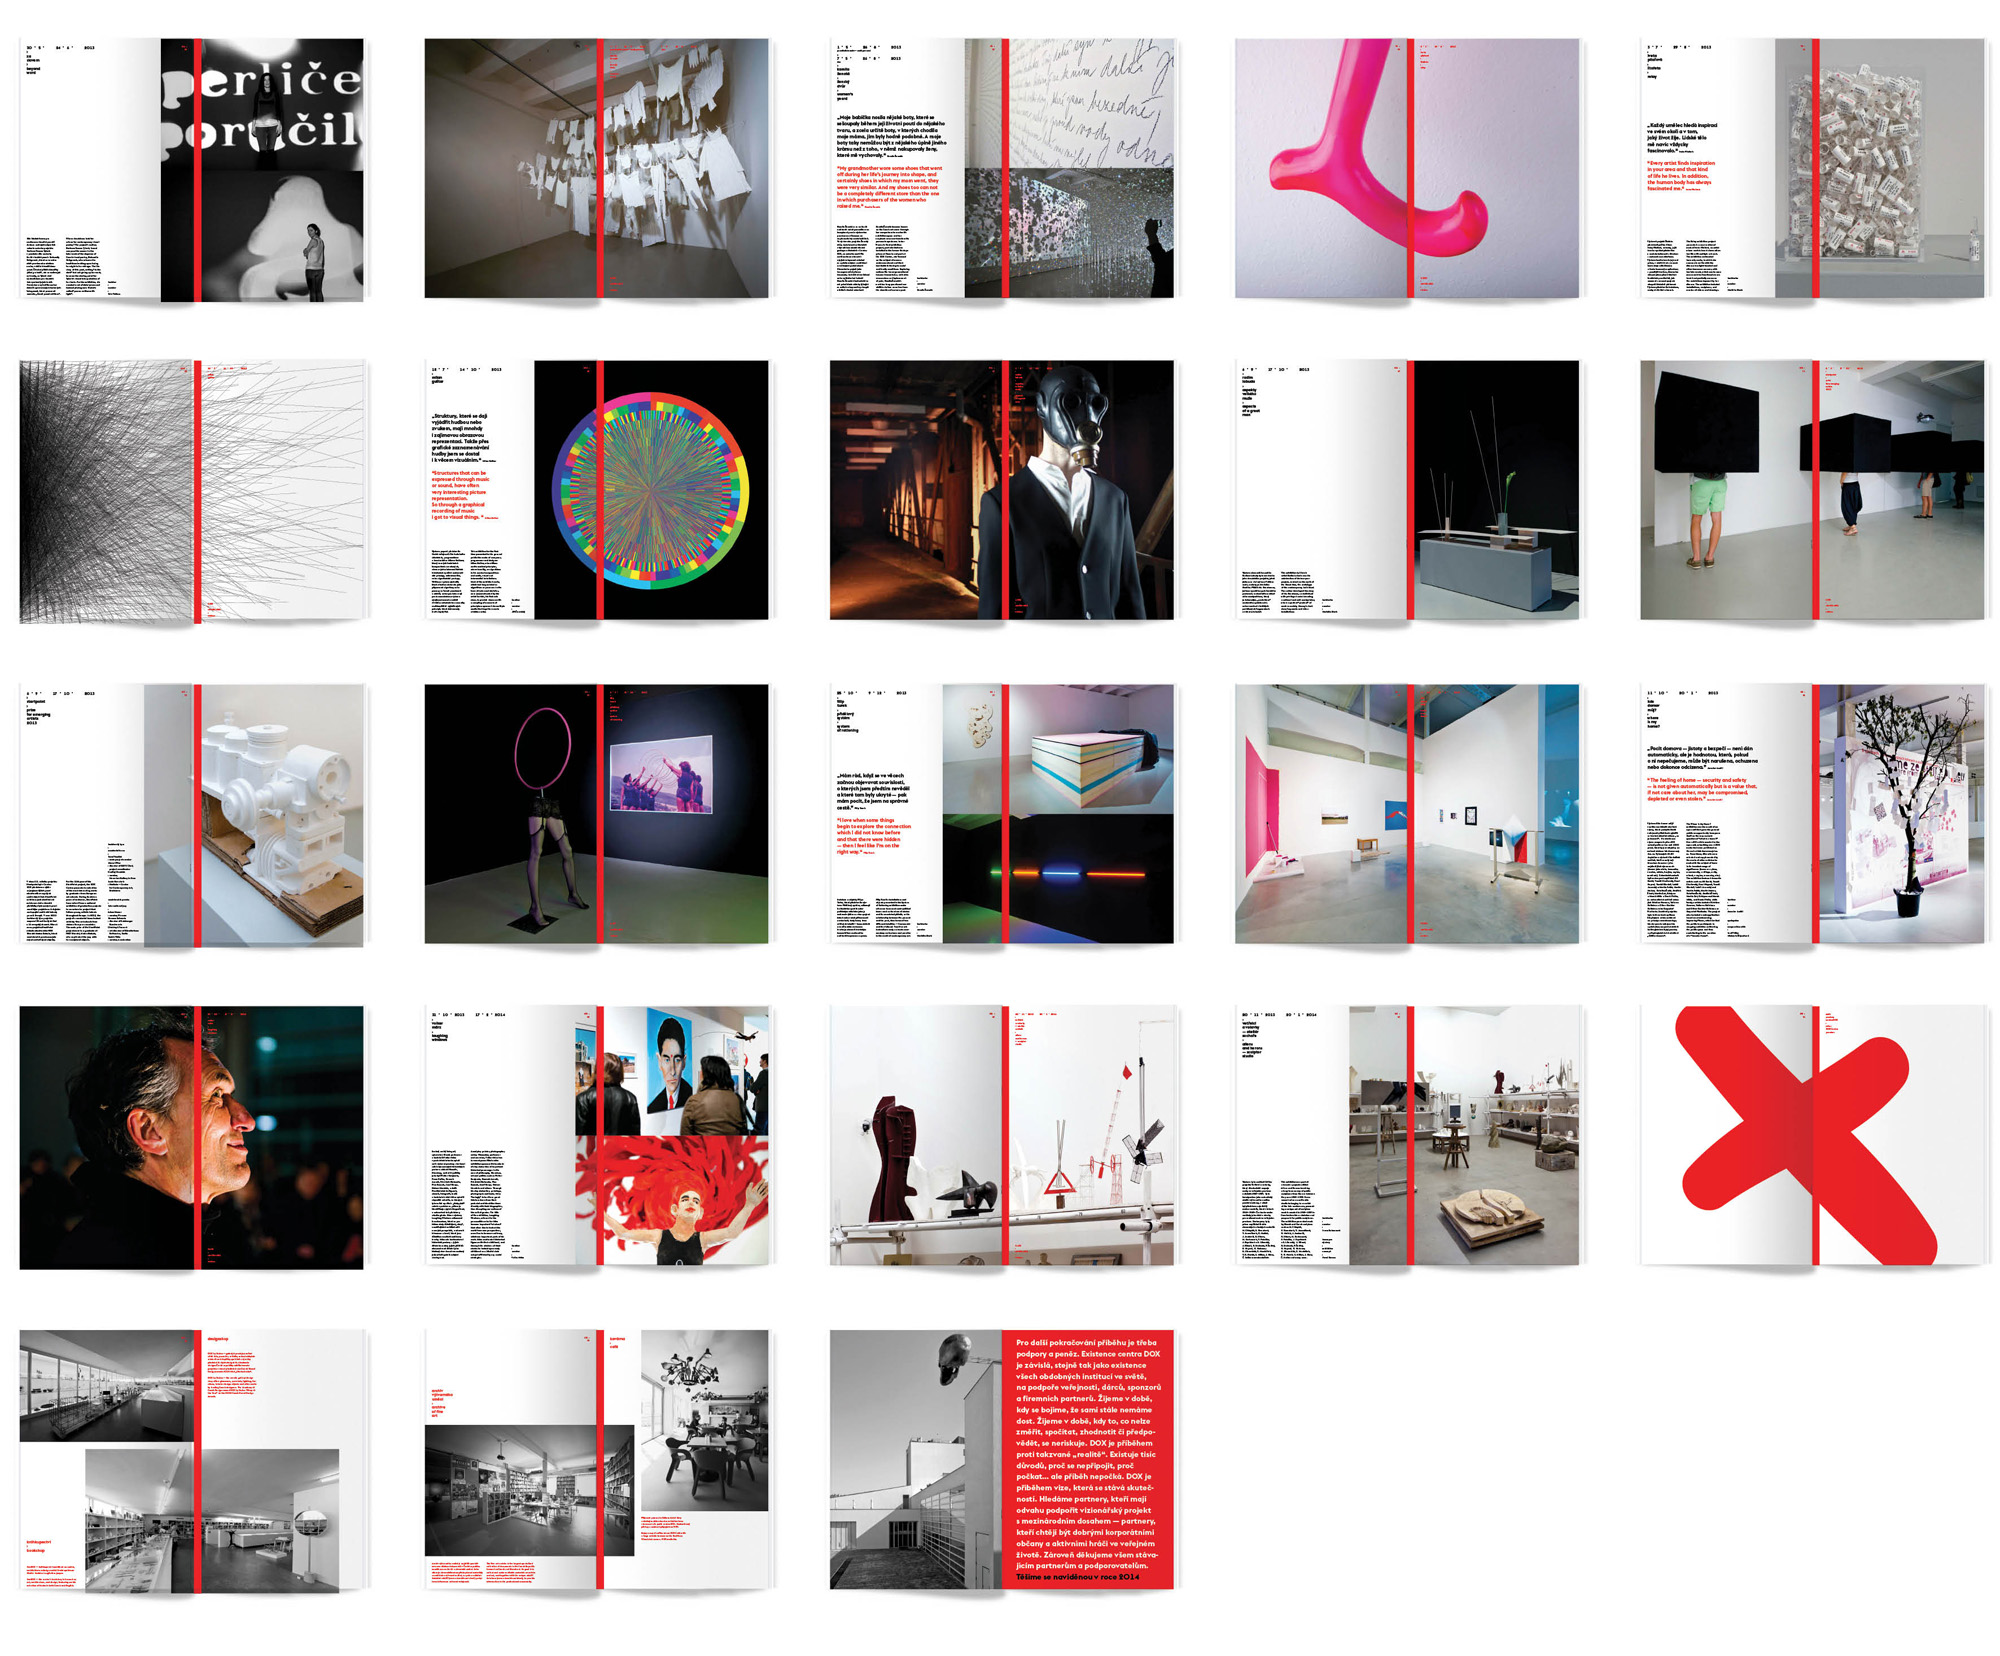 kristyna_greplova_diploma_project_10